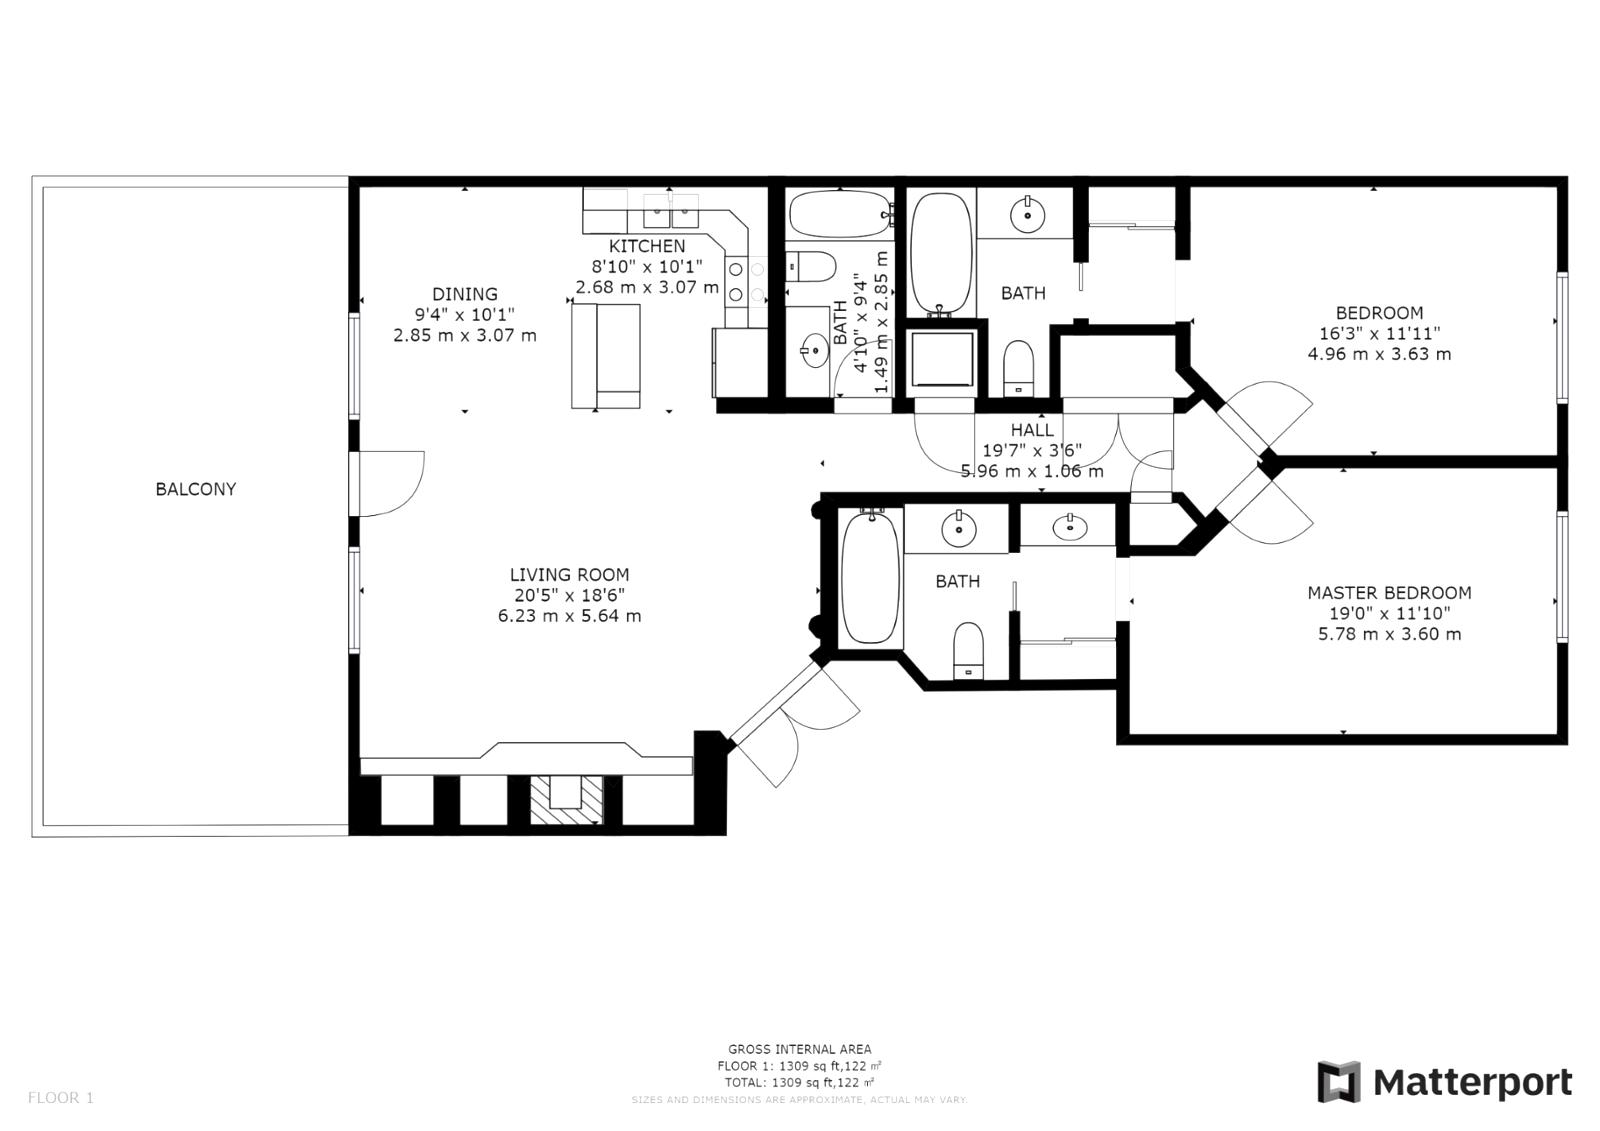 351A floor plan